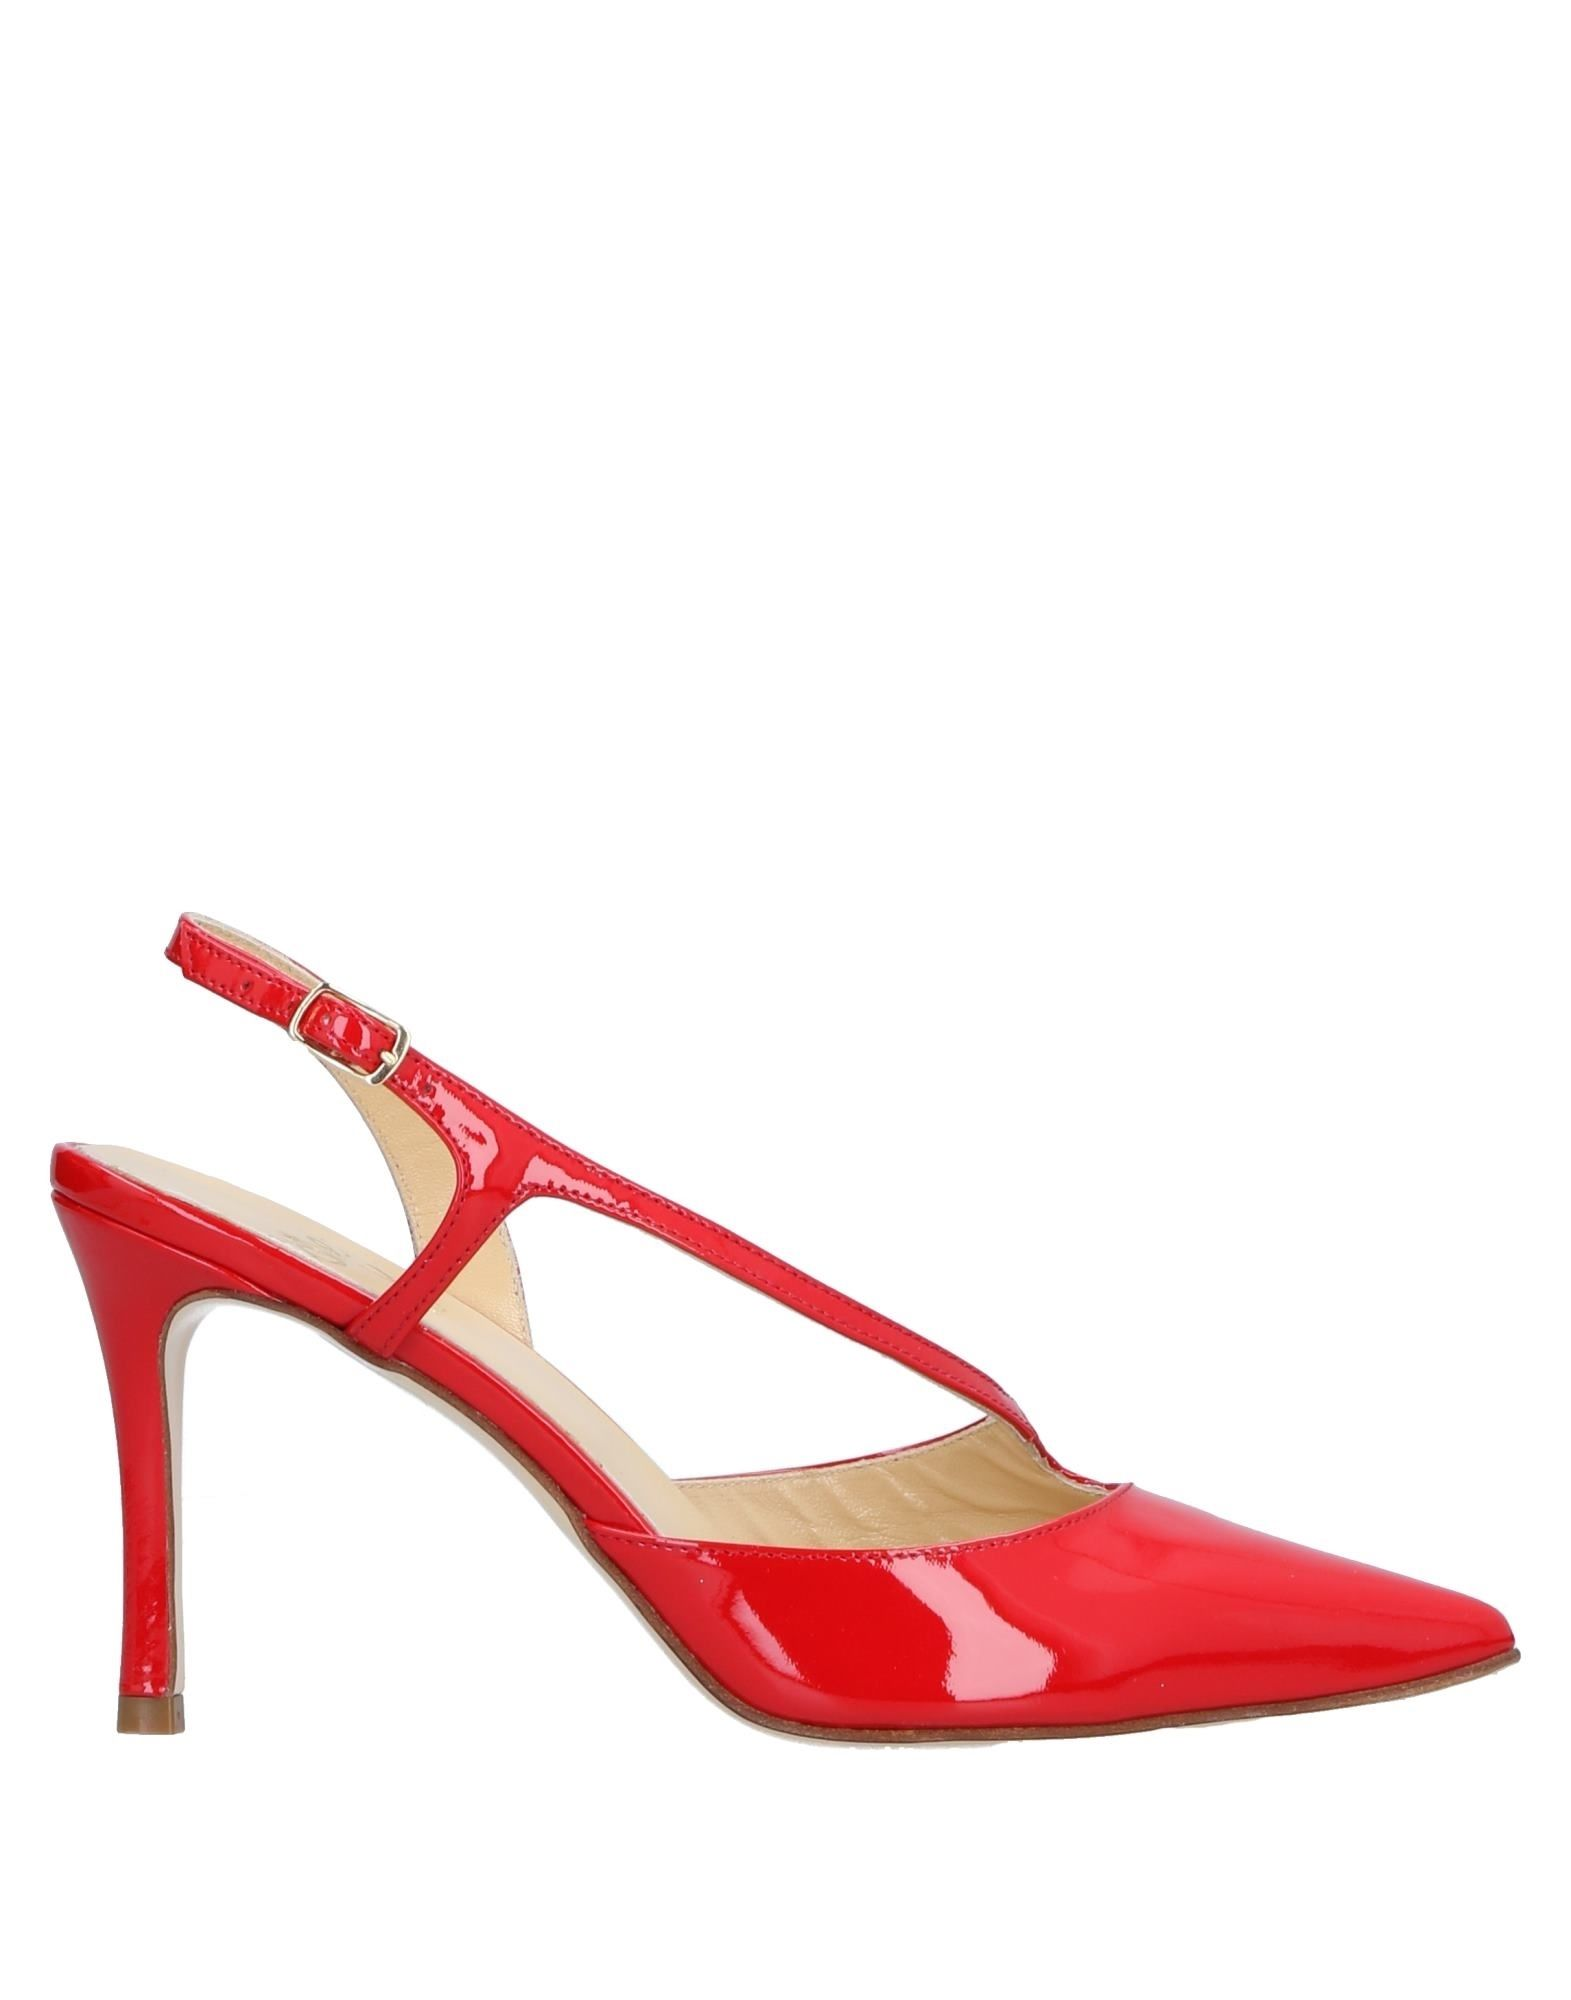 Mocassino Valleverde offerte Donna - 11553031MQ Nuove offerte Valleverde e scarpe comode 501fbb